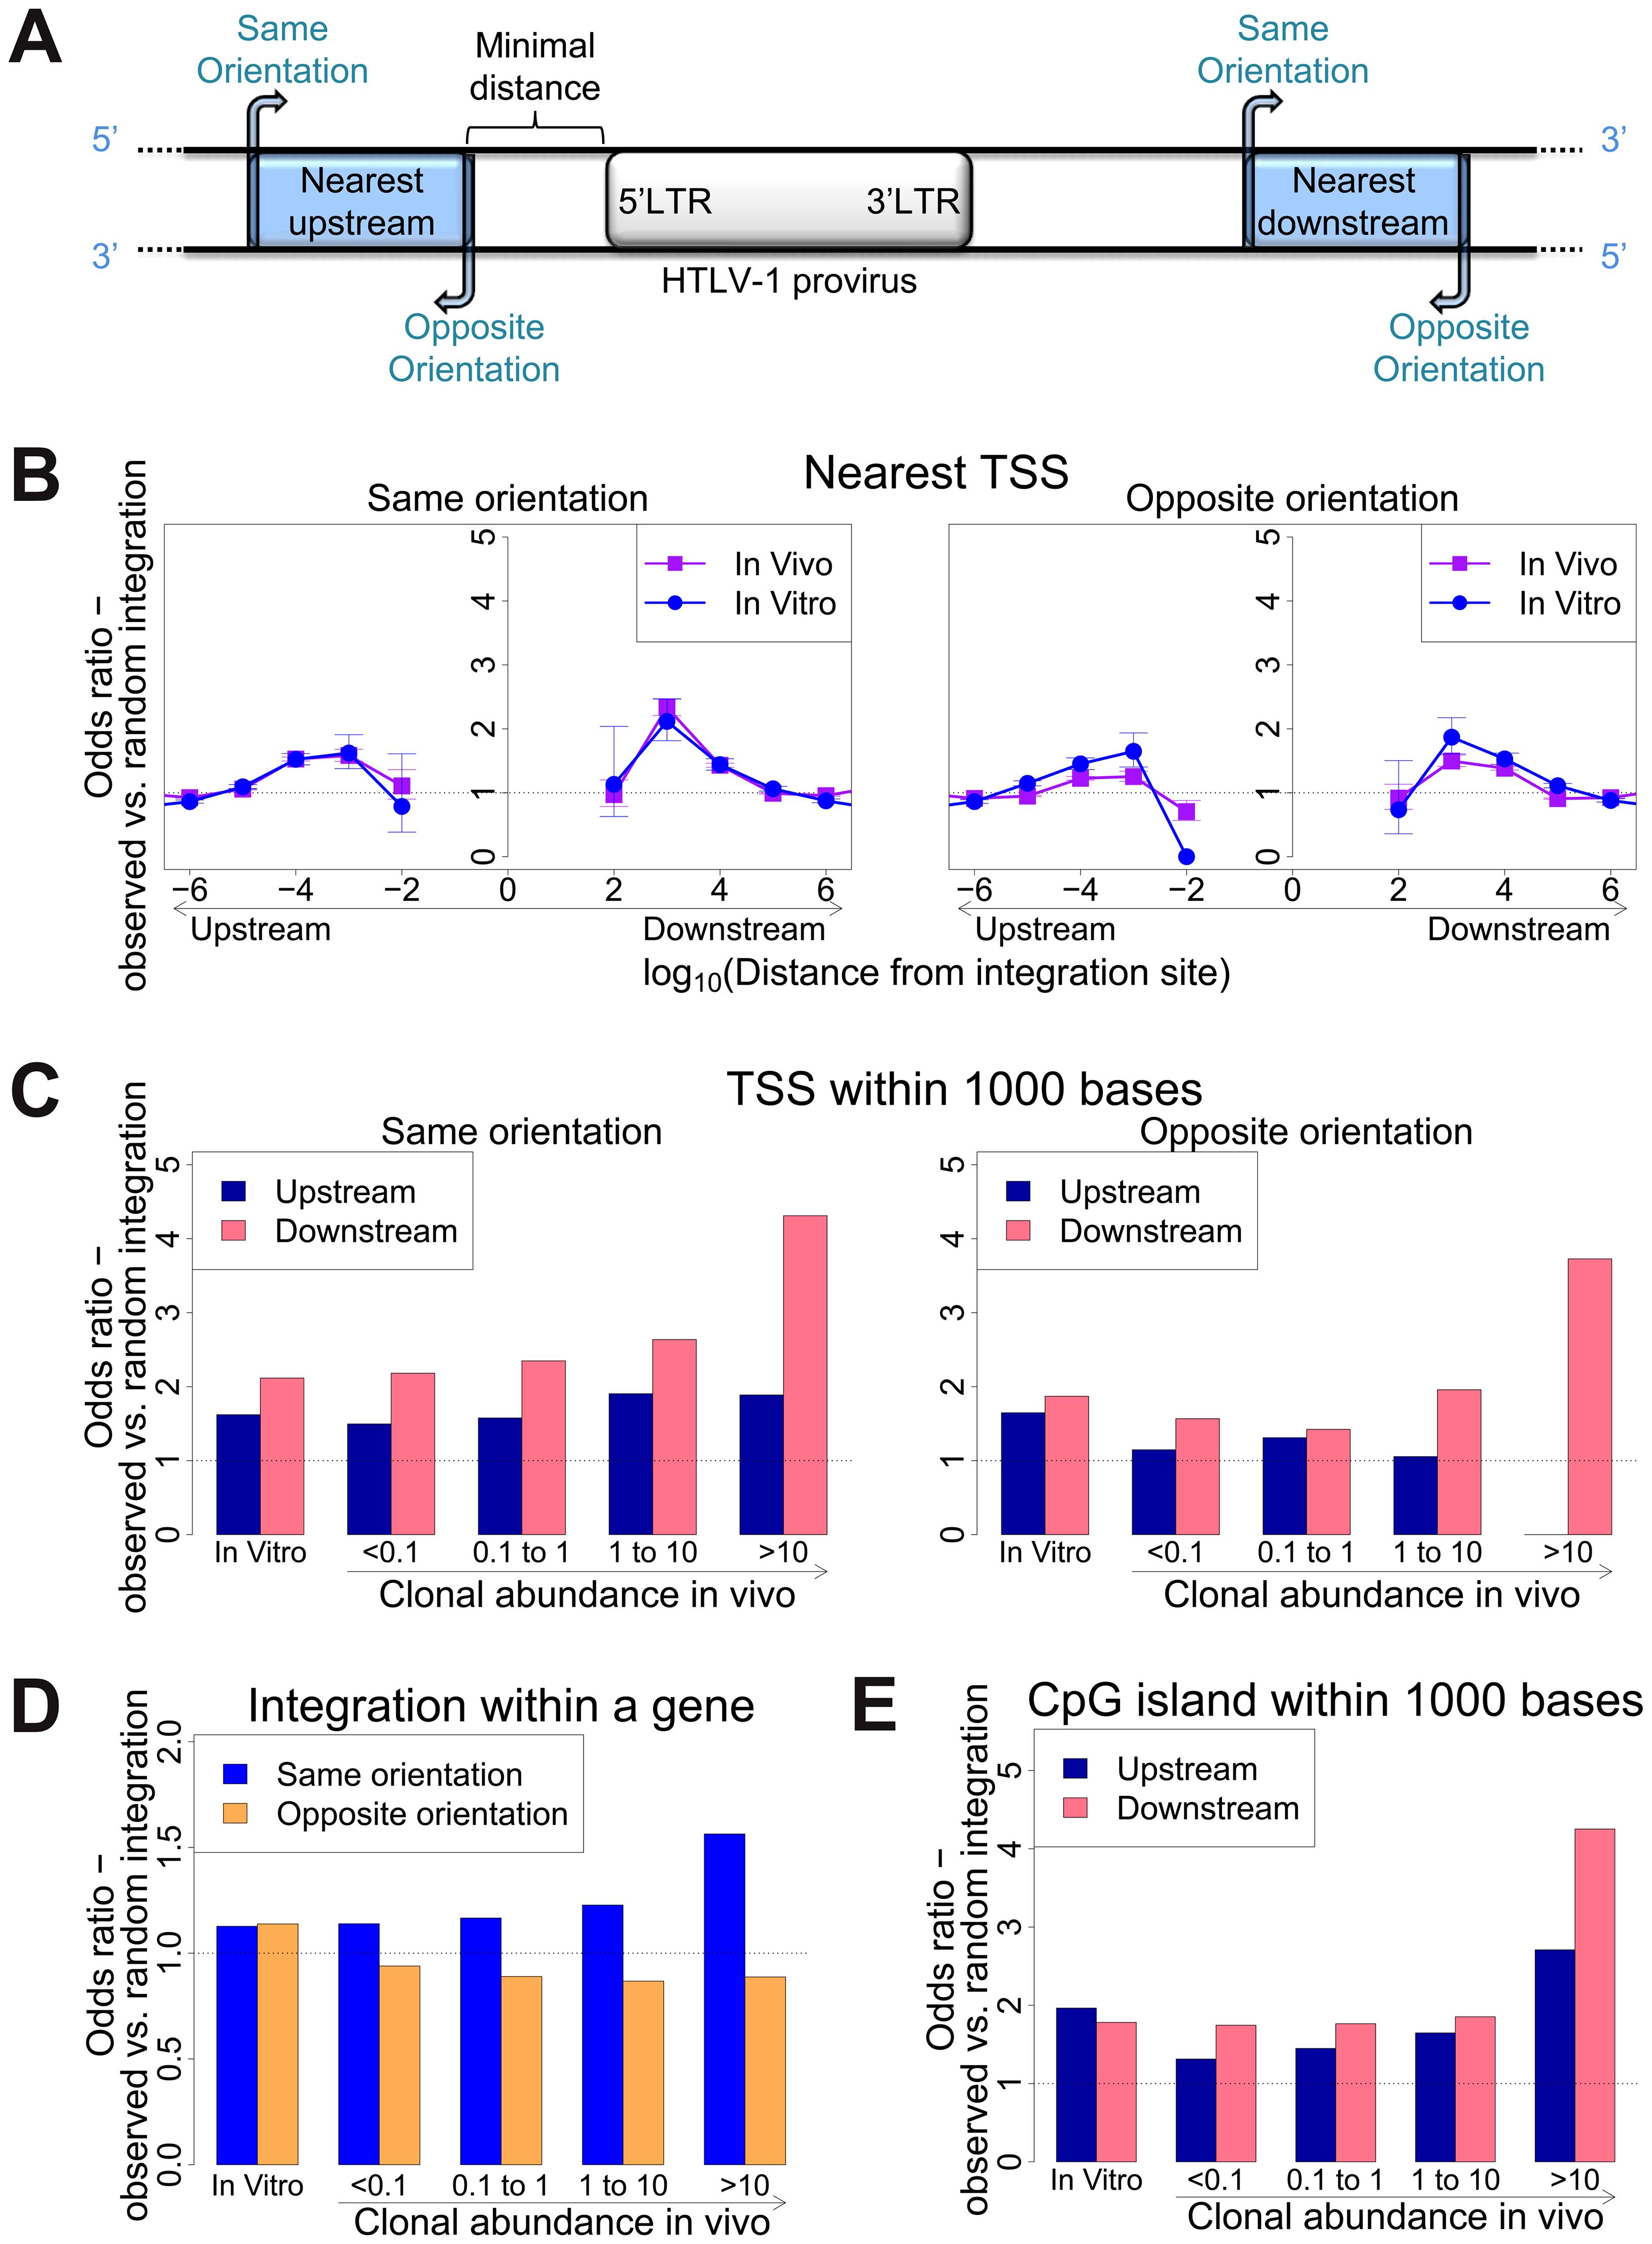 Genomic environment at HTLV-1 proviral integration site determines integration in vitro and abundance in vivo.